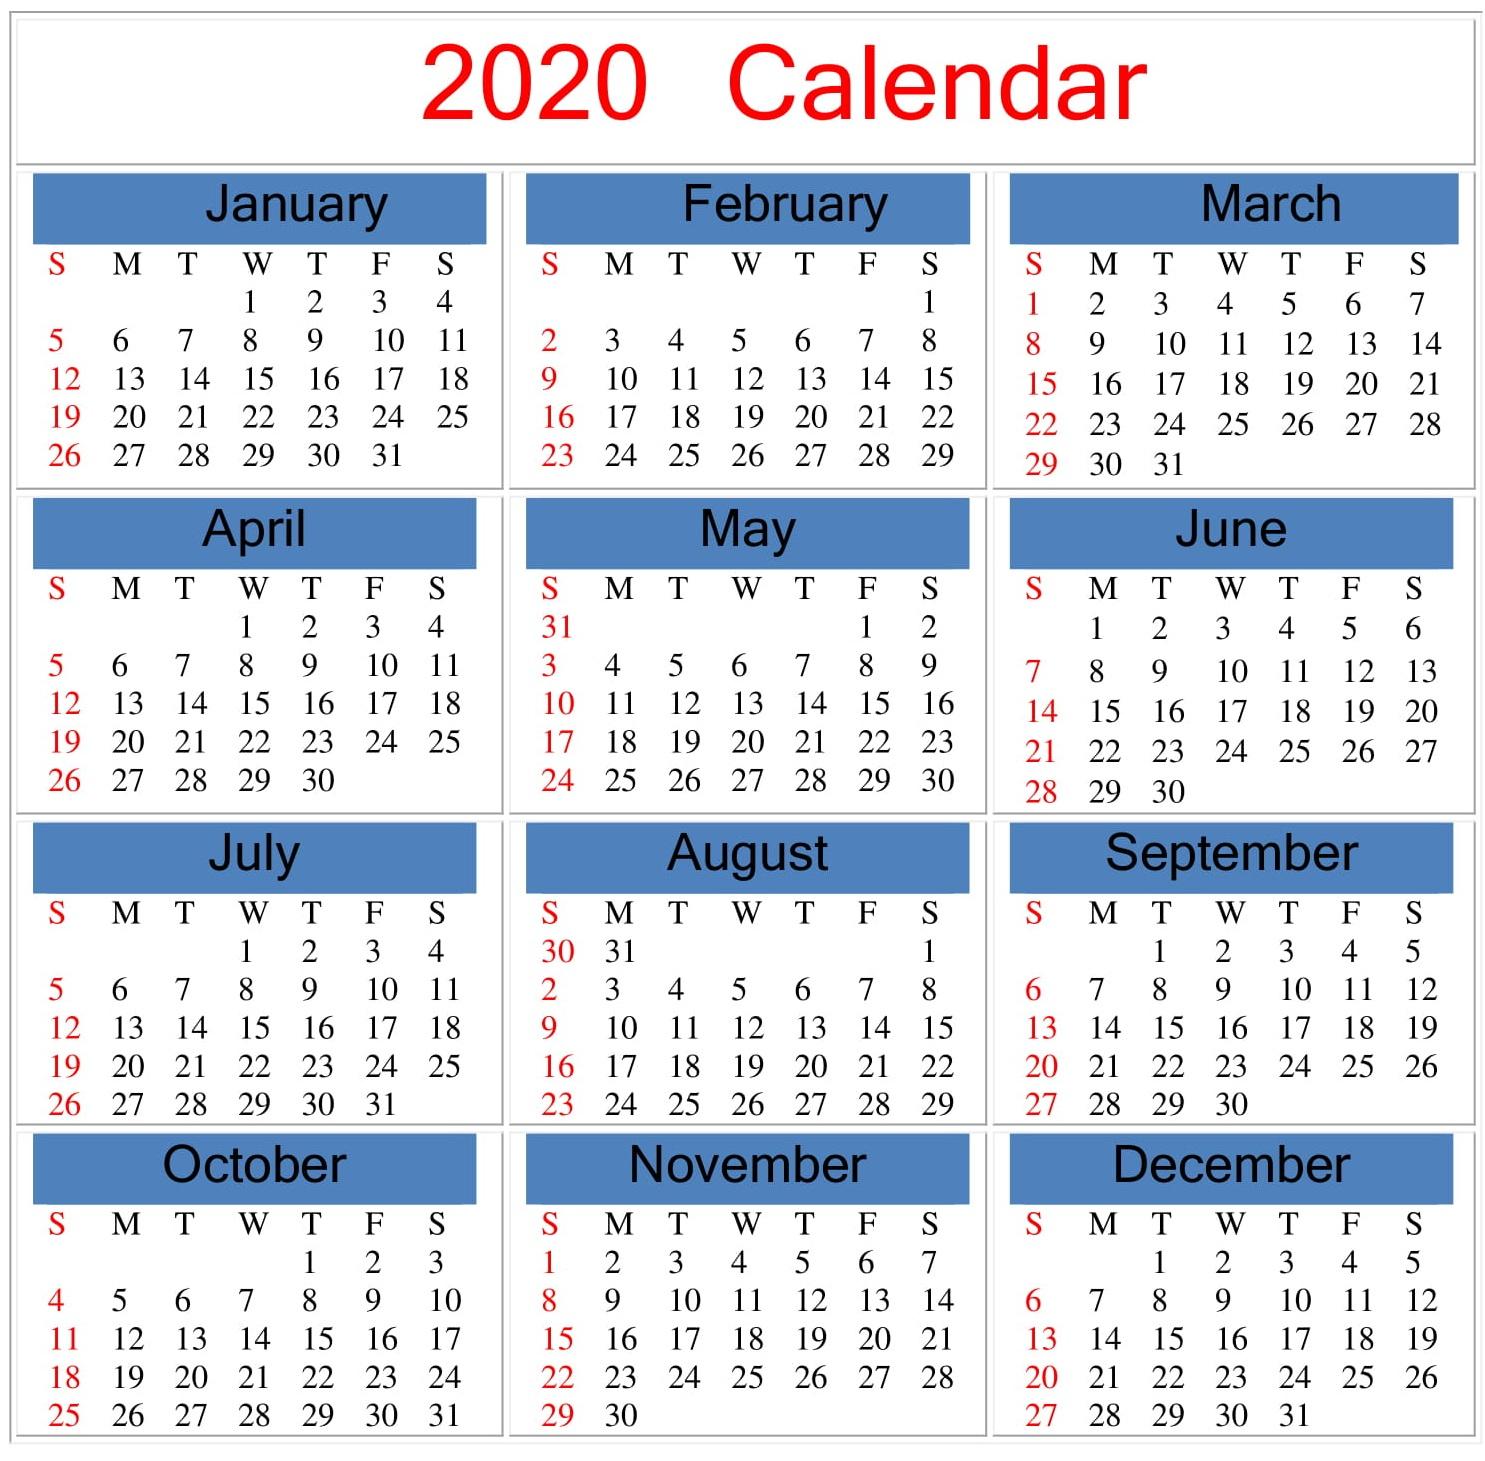 Free Printable 2020 Calendar Word, Pdf, Excel Document With Regard To Julian To Gregorian Calendar 2022